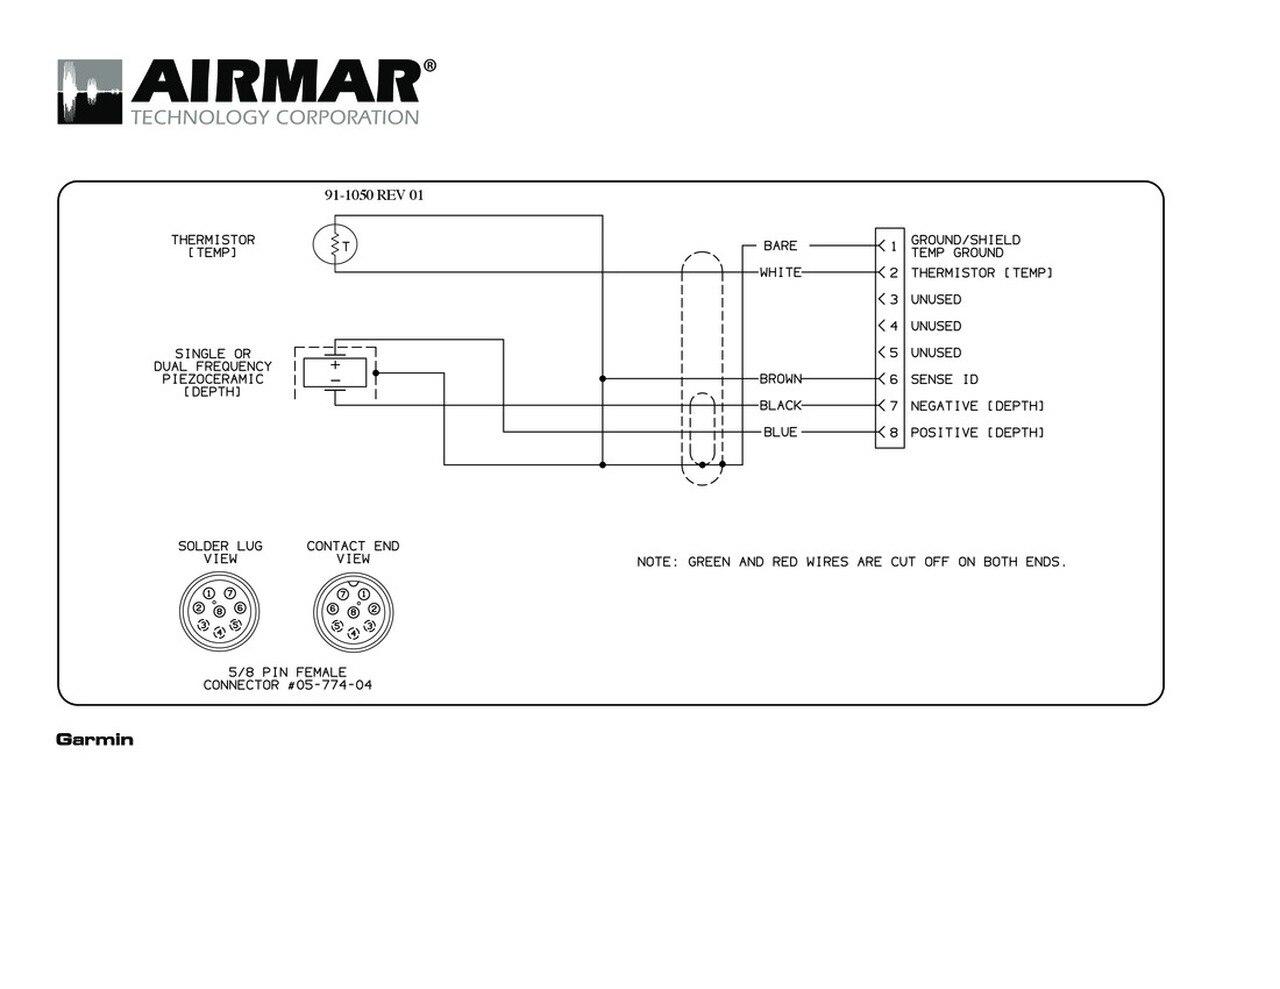 441s Garmin Wiring Diagram Data Wiring Diagram